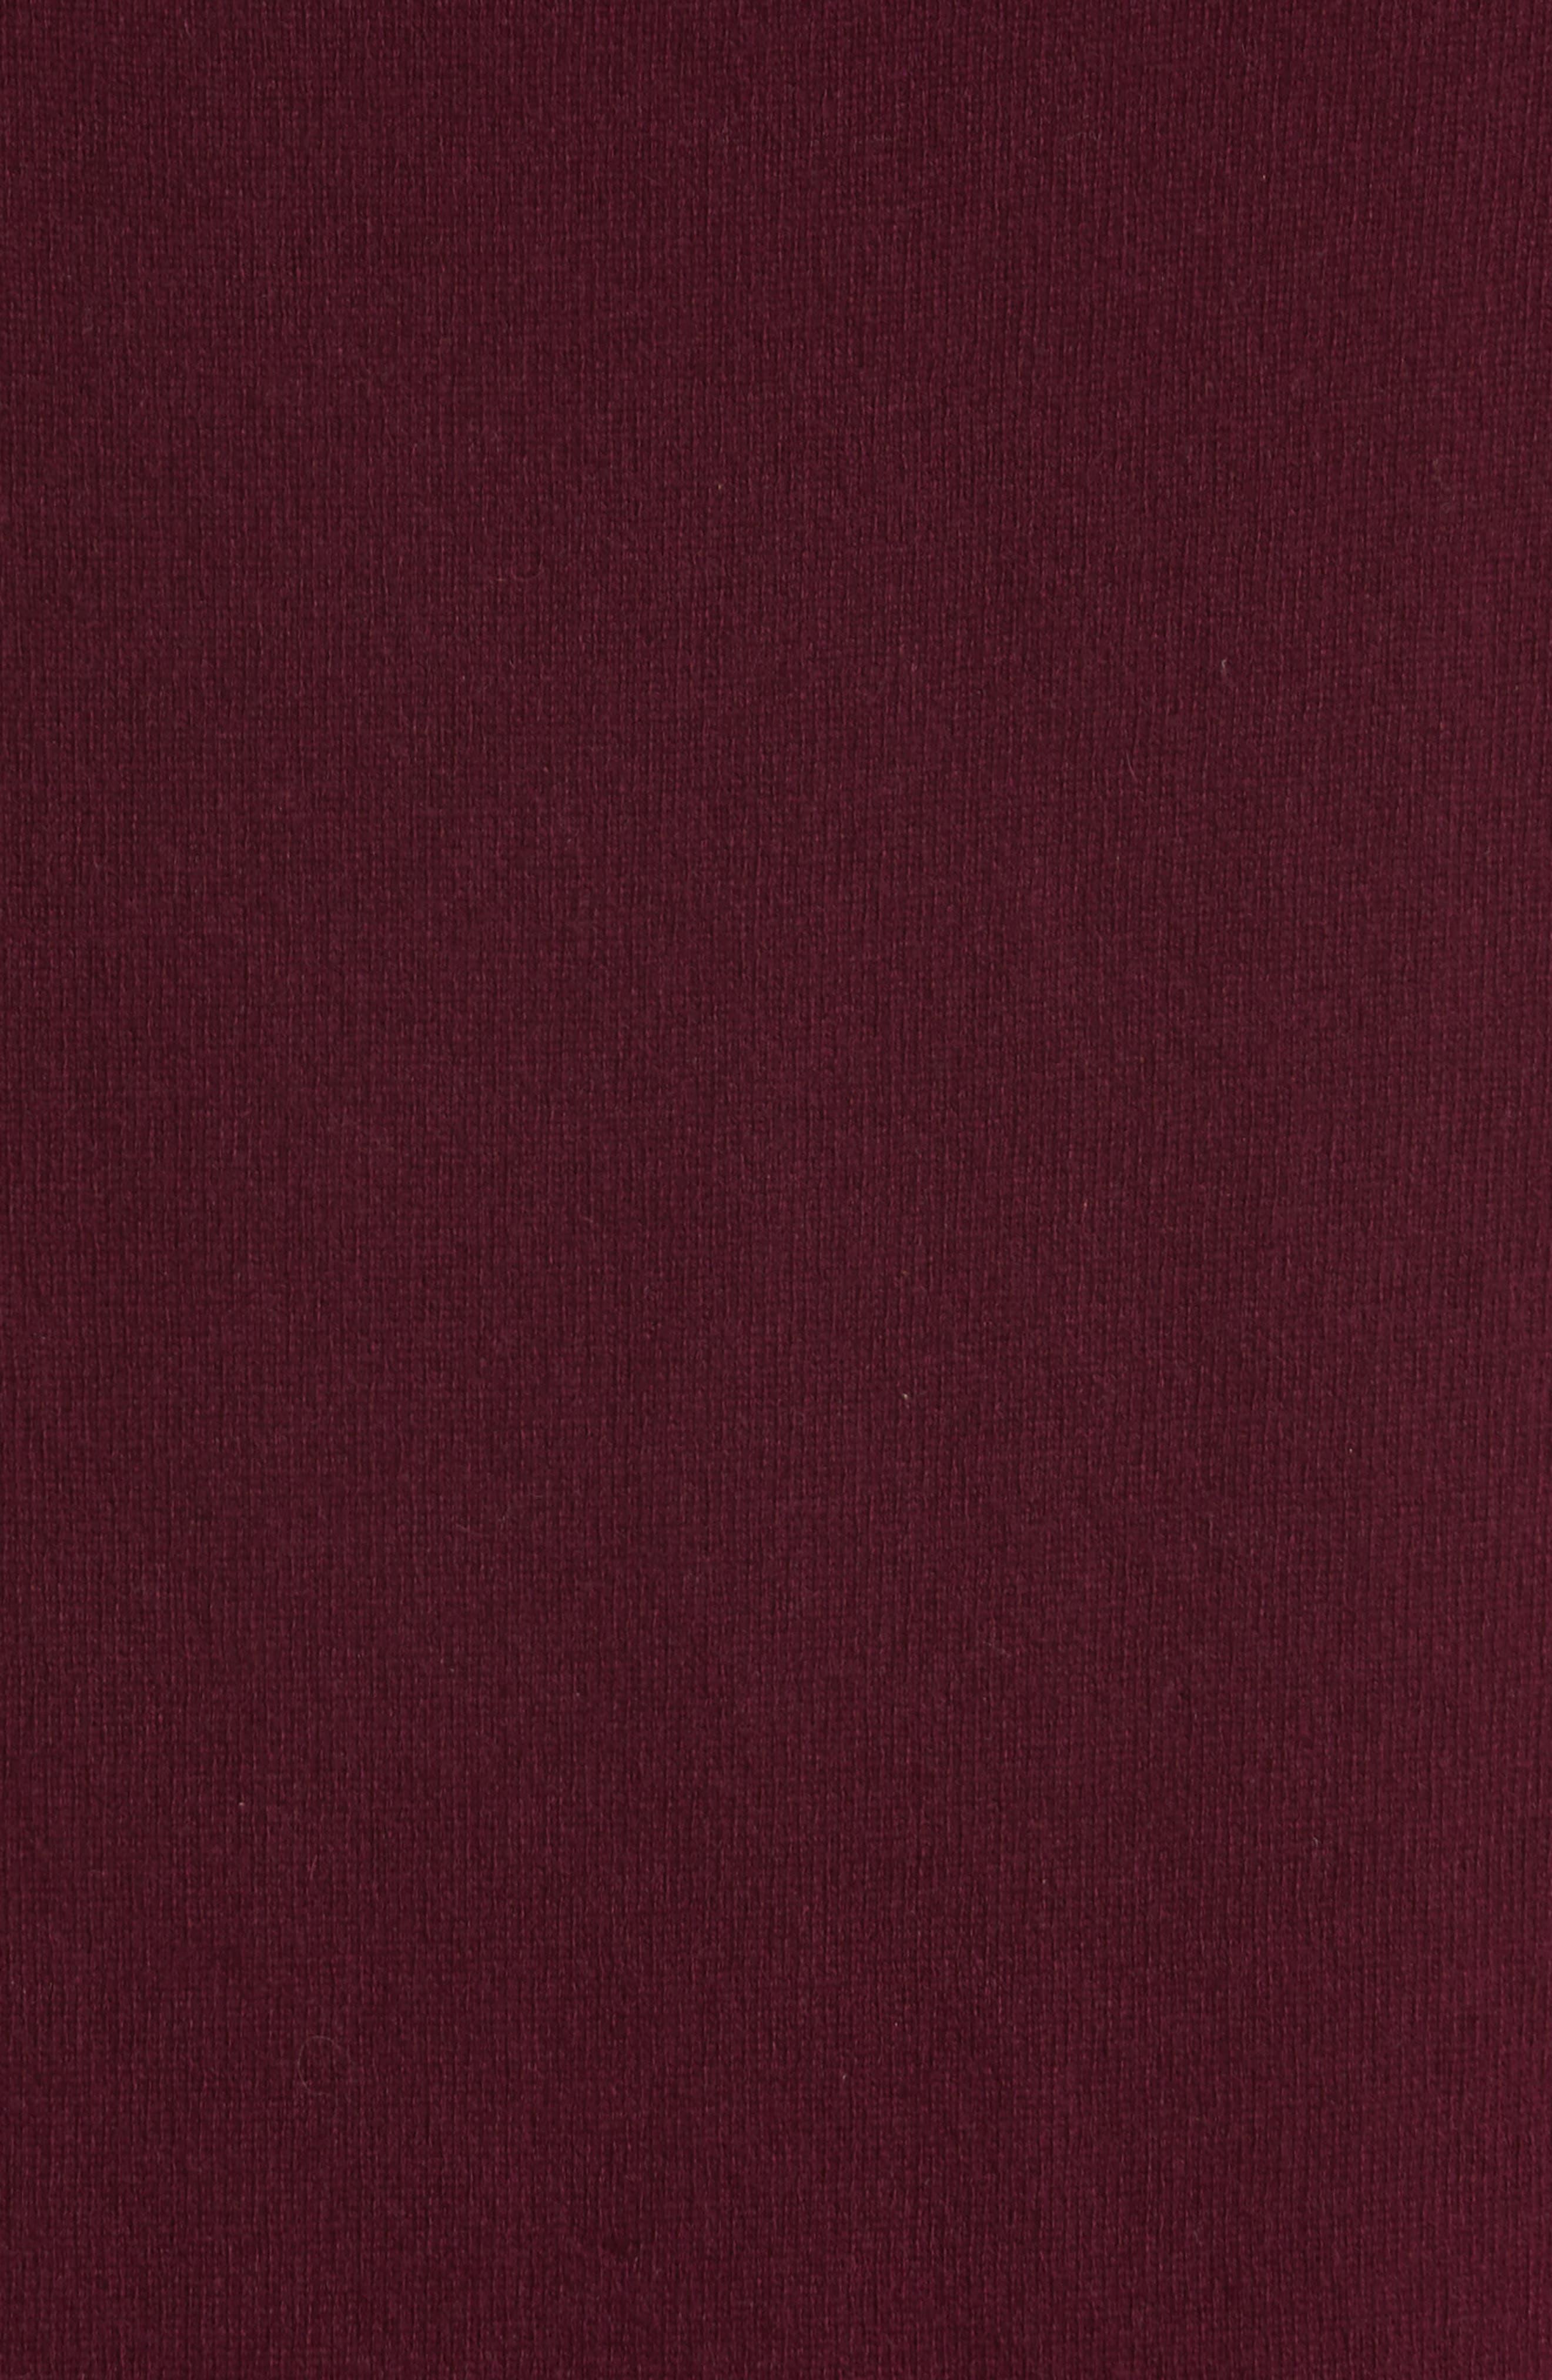 Neto Wool & Cashmere Fringe Sweater Dress,                             Alternate thumbnail 5, color,                             601